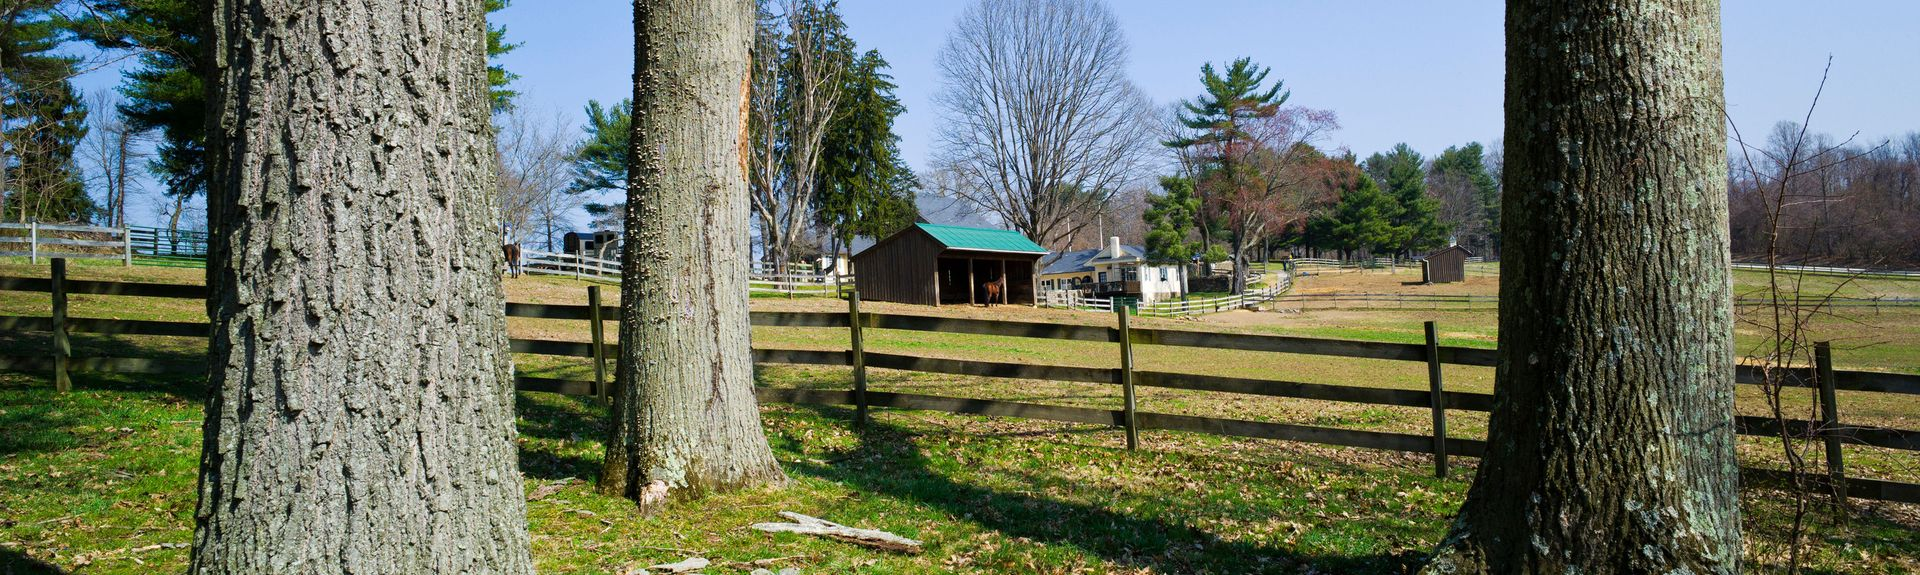 Hidden Valley, Somerset, Pennsylvania, United States of America